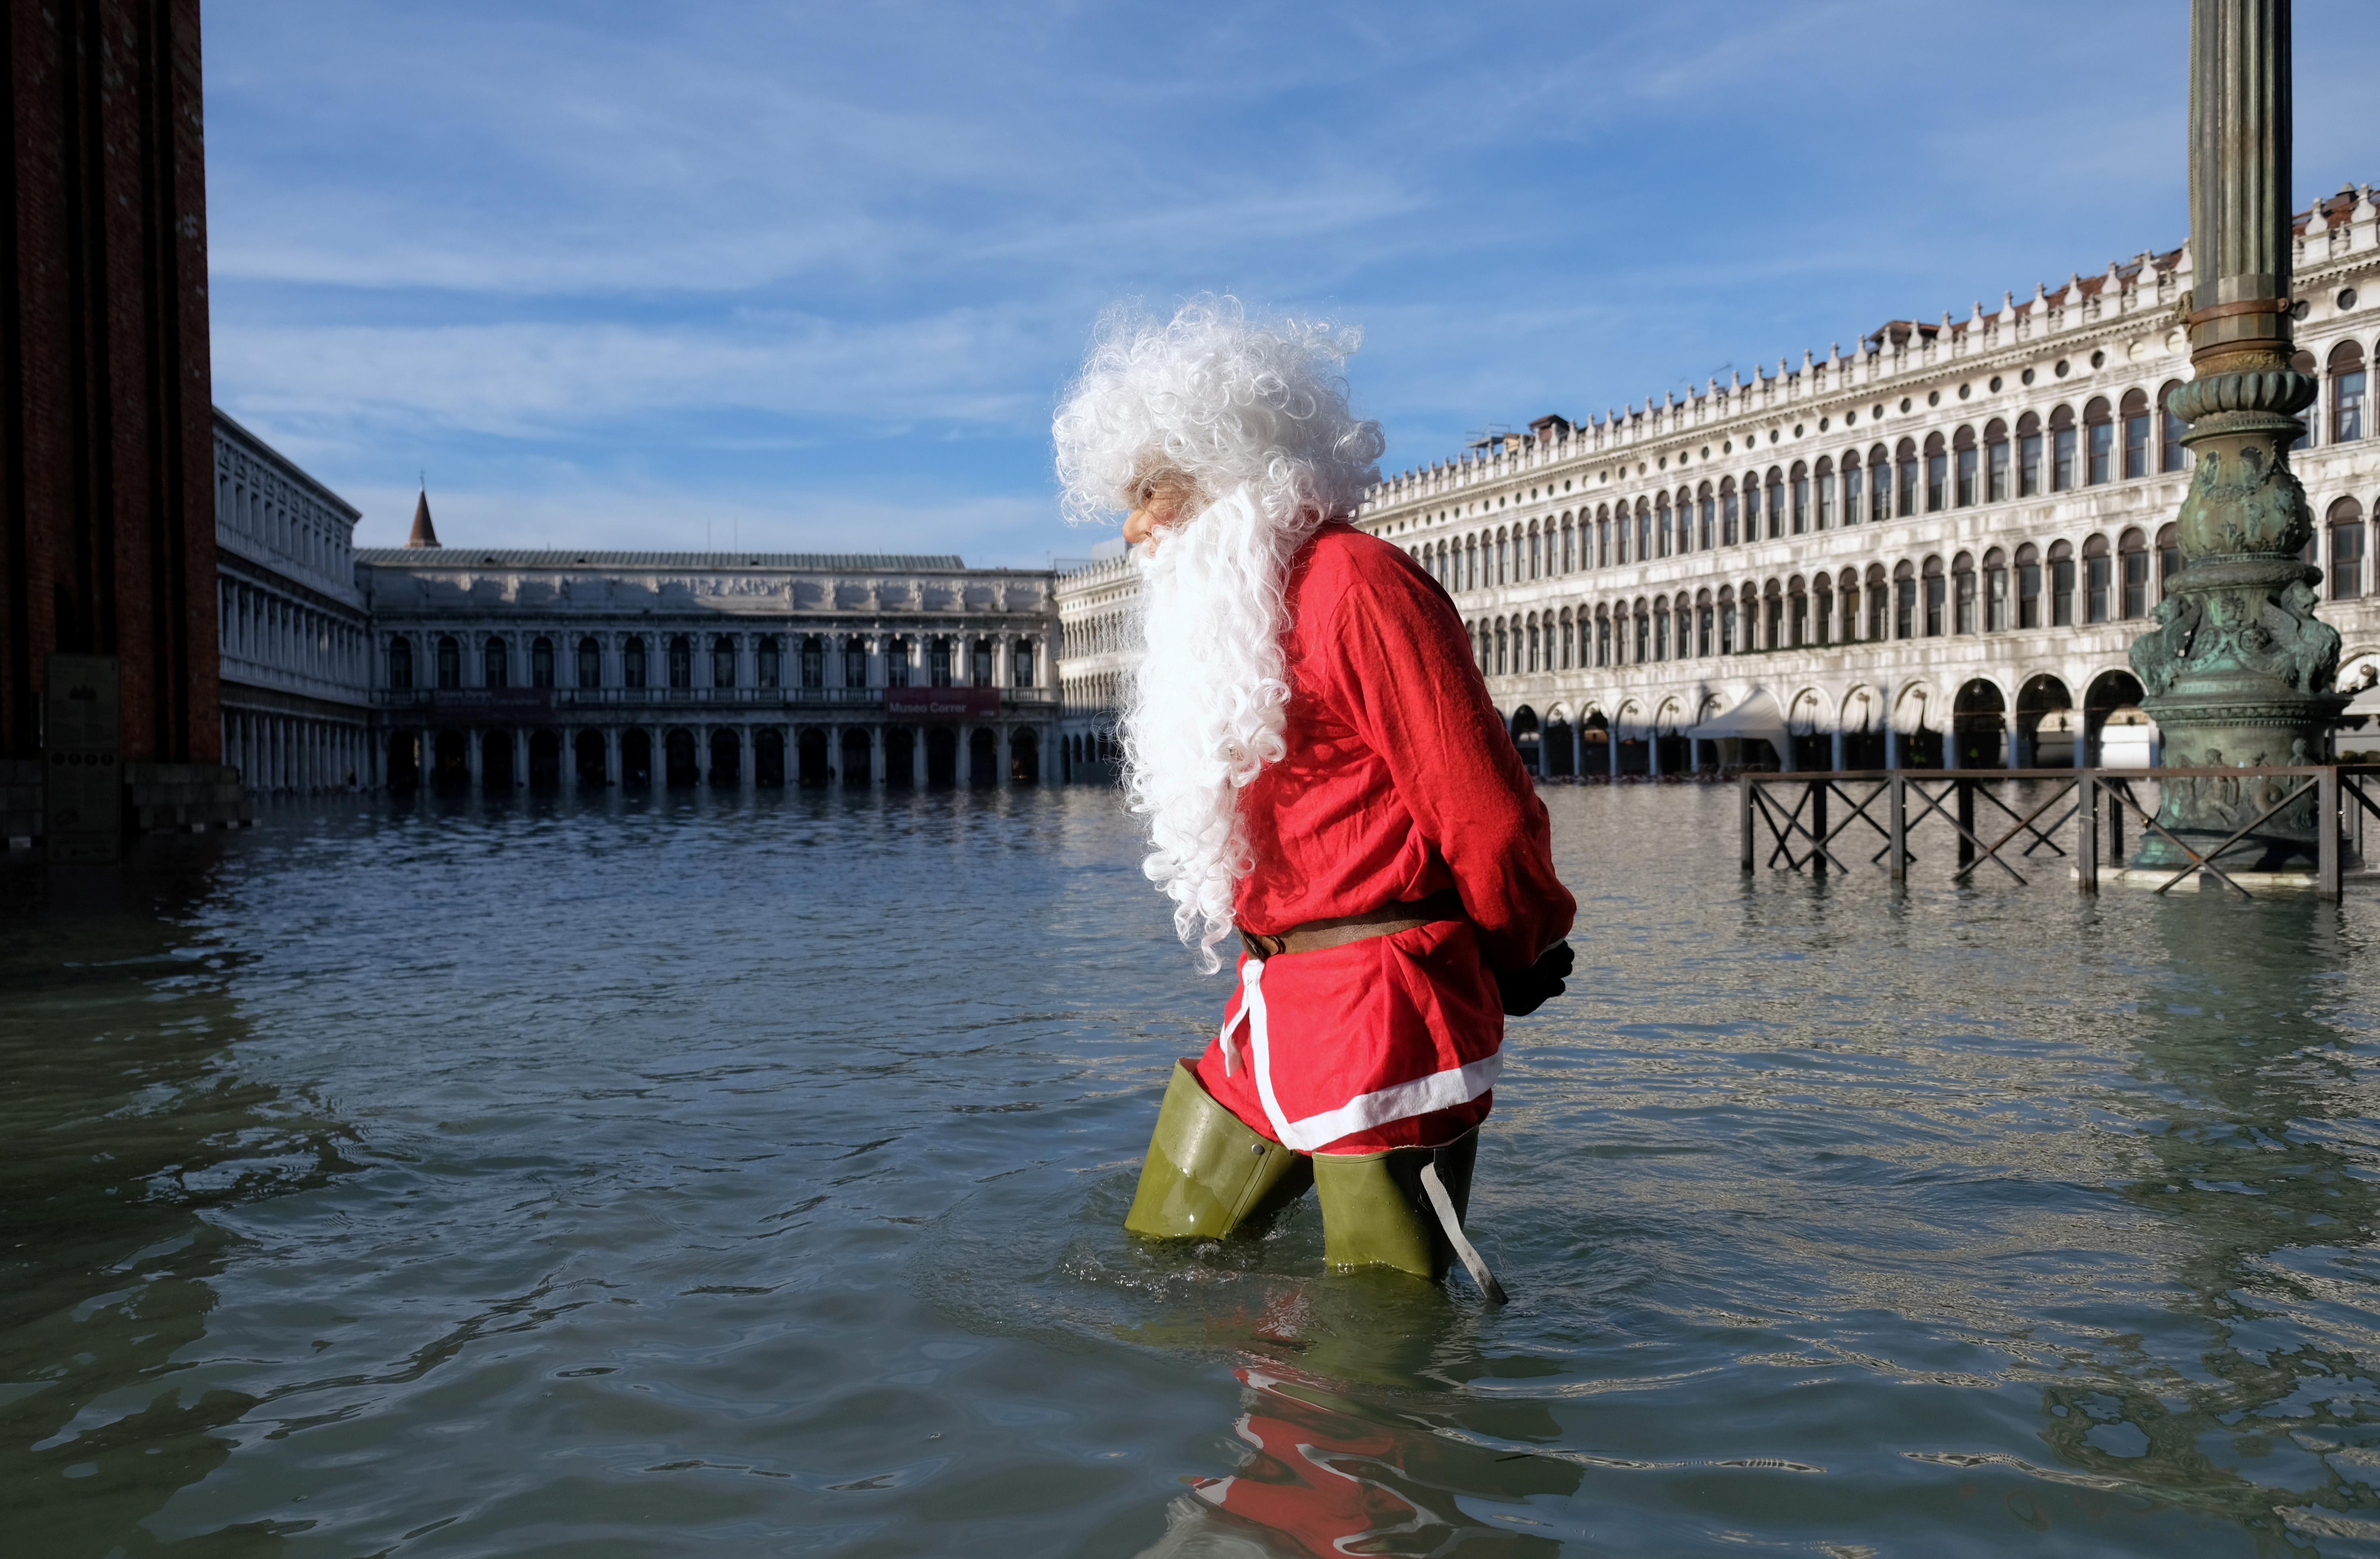 El hombre caminó también por la Plaza de San Marcos de Venecia. (Reuters/ Manuel Silvestri)